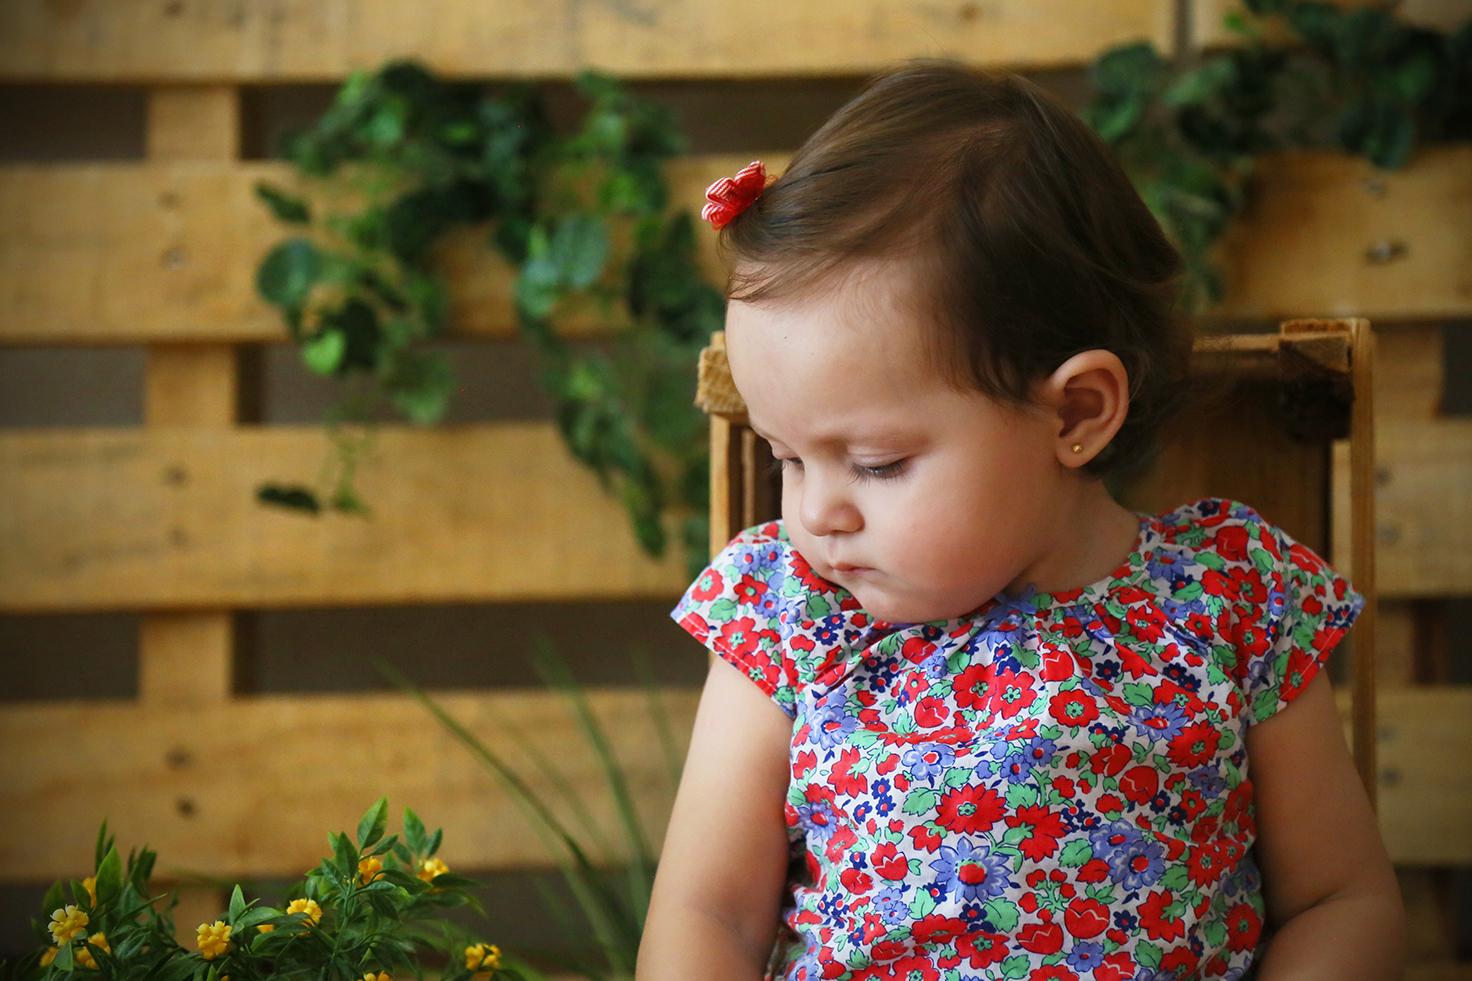 Maroge-Angela-Velazquez-fotografia-bebe-18